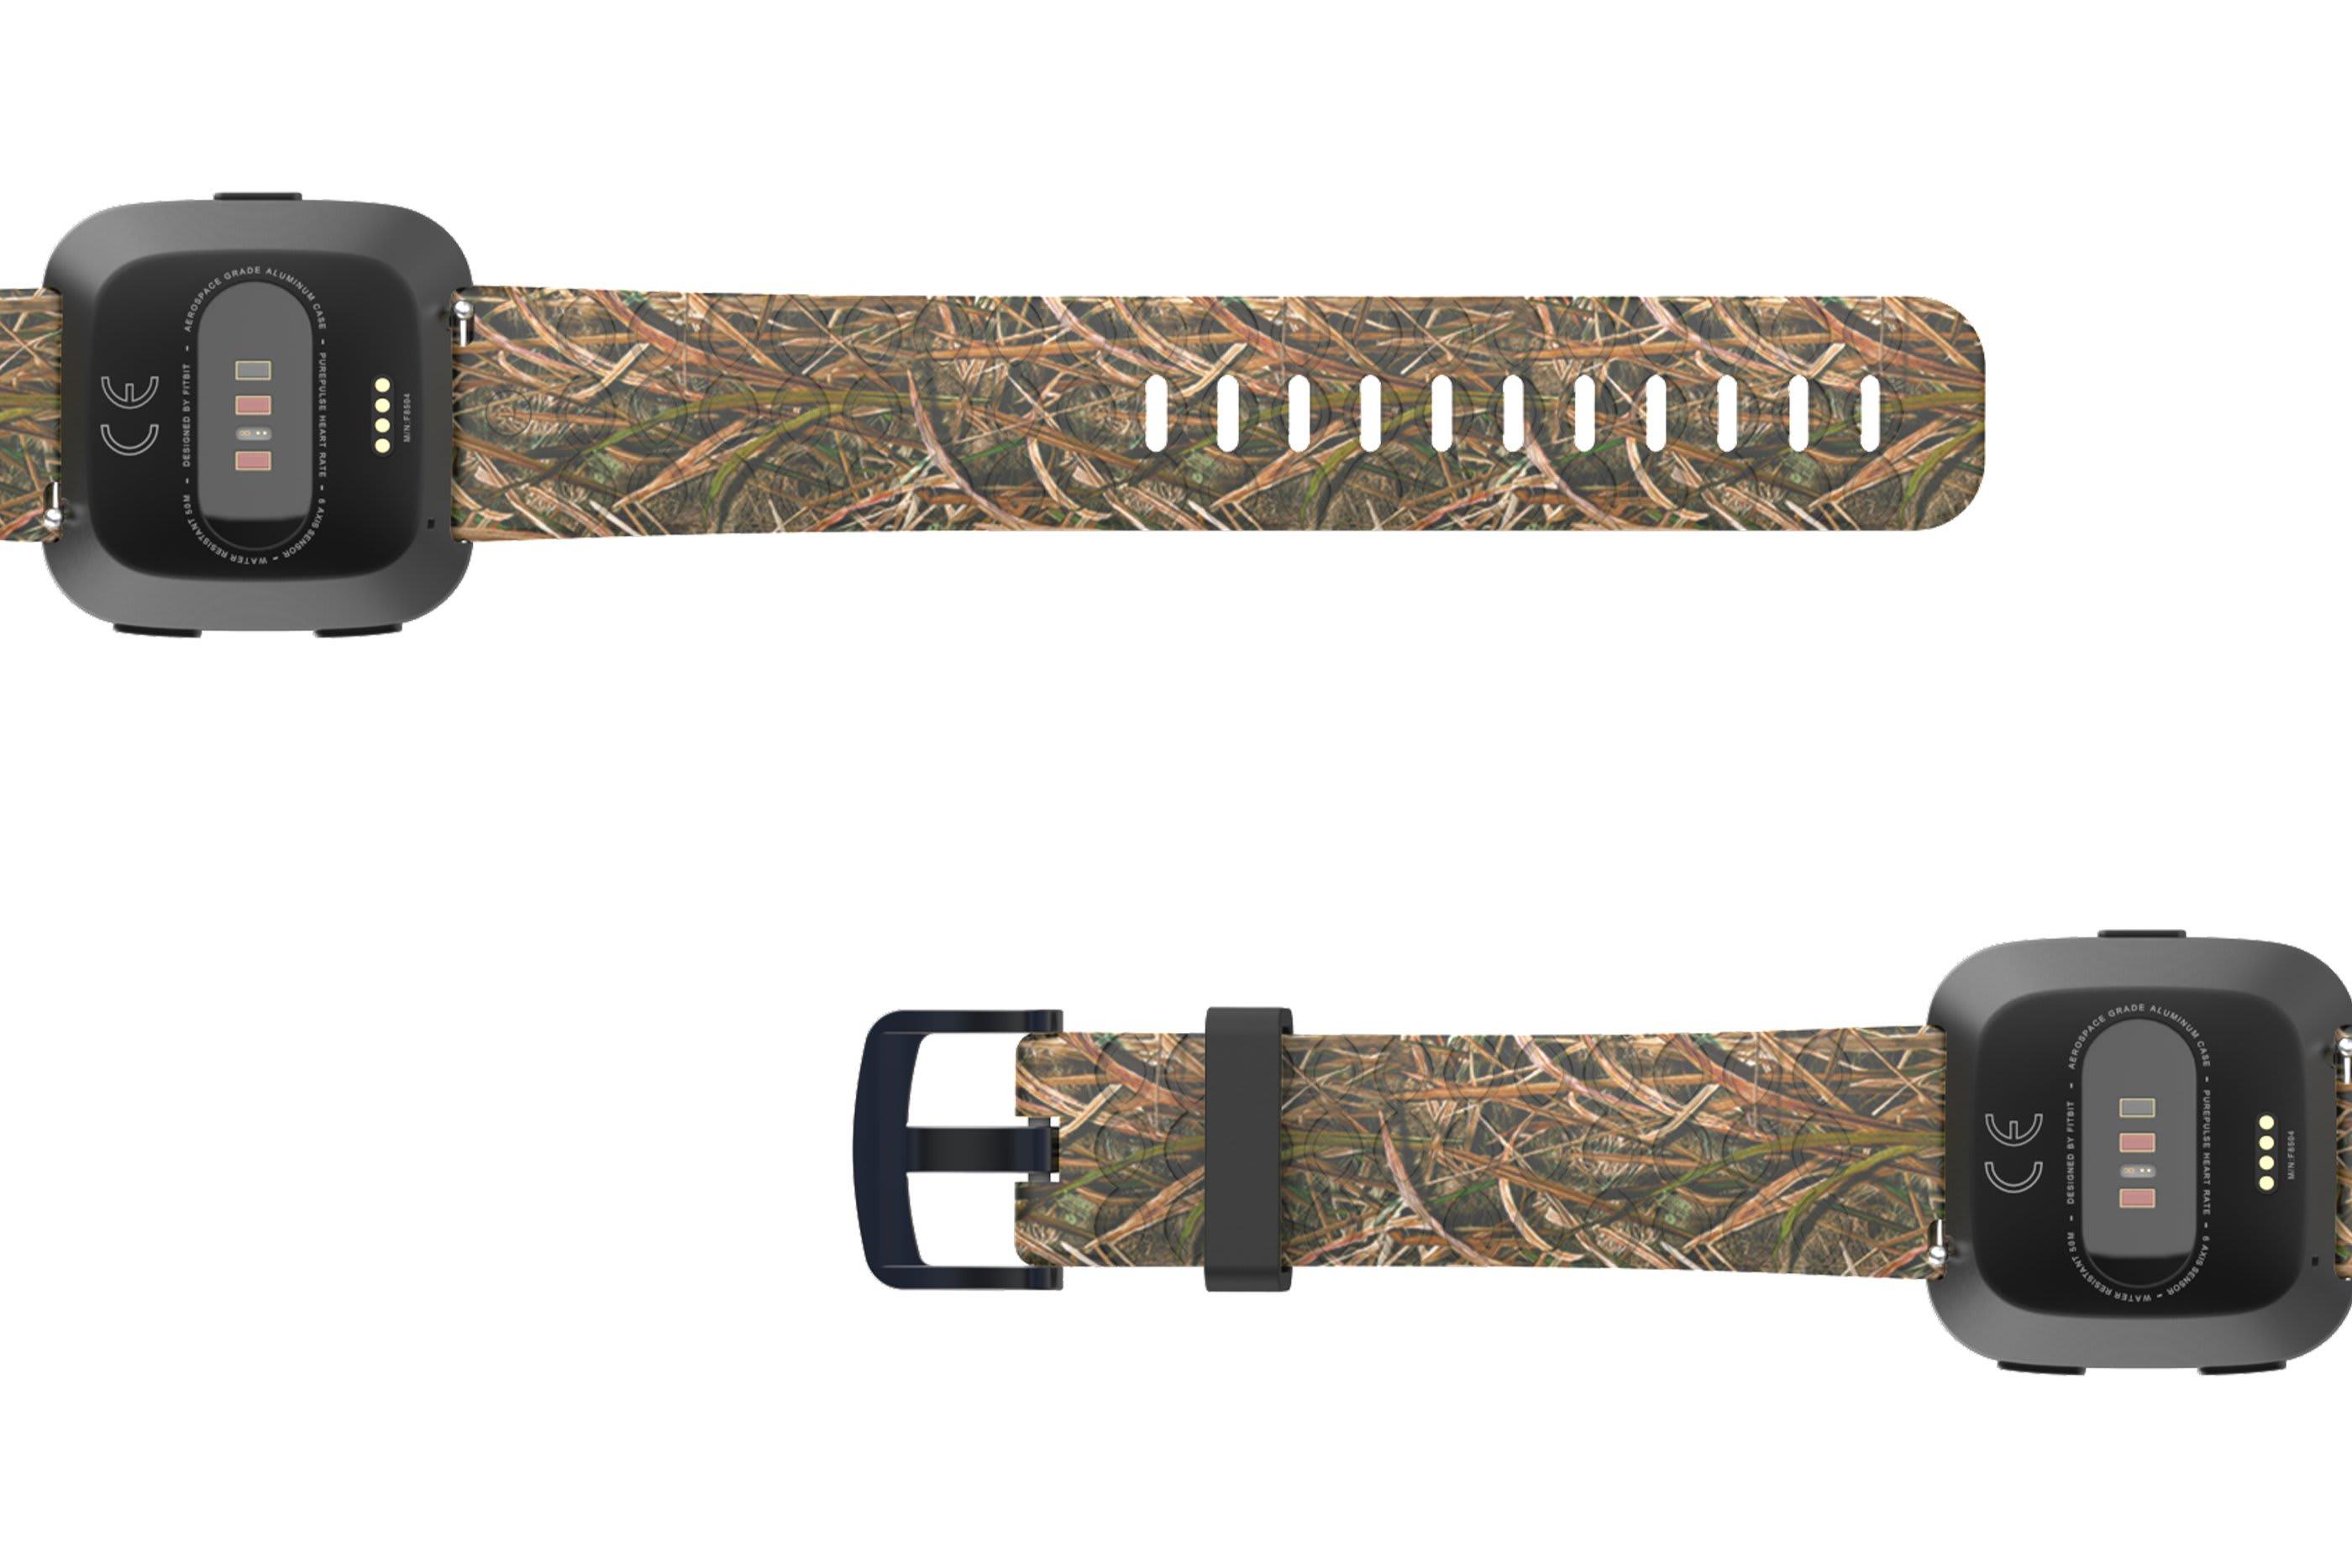 Mossy Oak Blades Fitbit Versa   watch band viewed bottom up